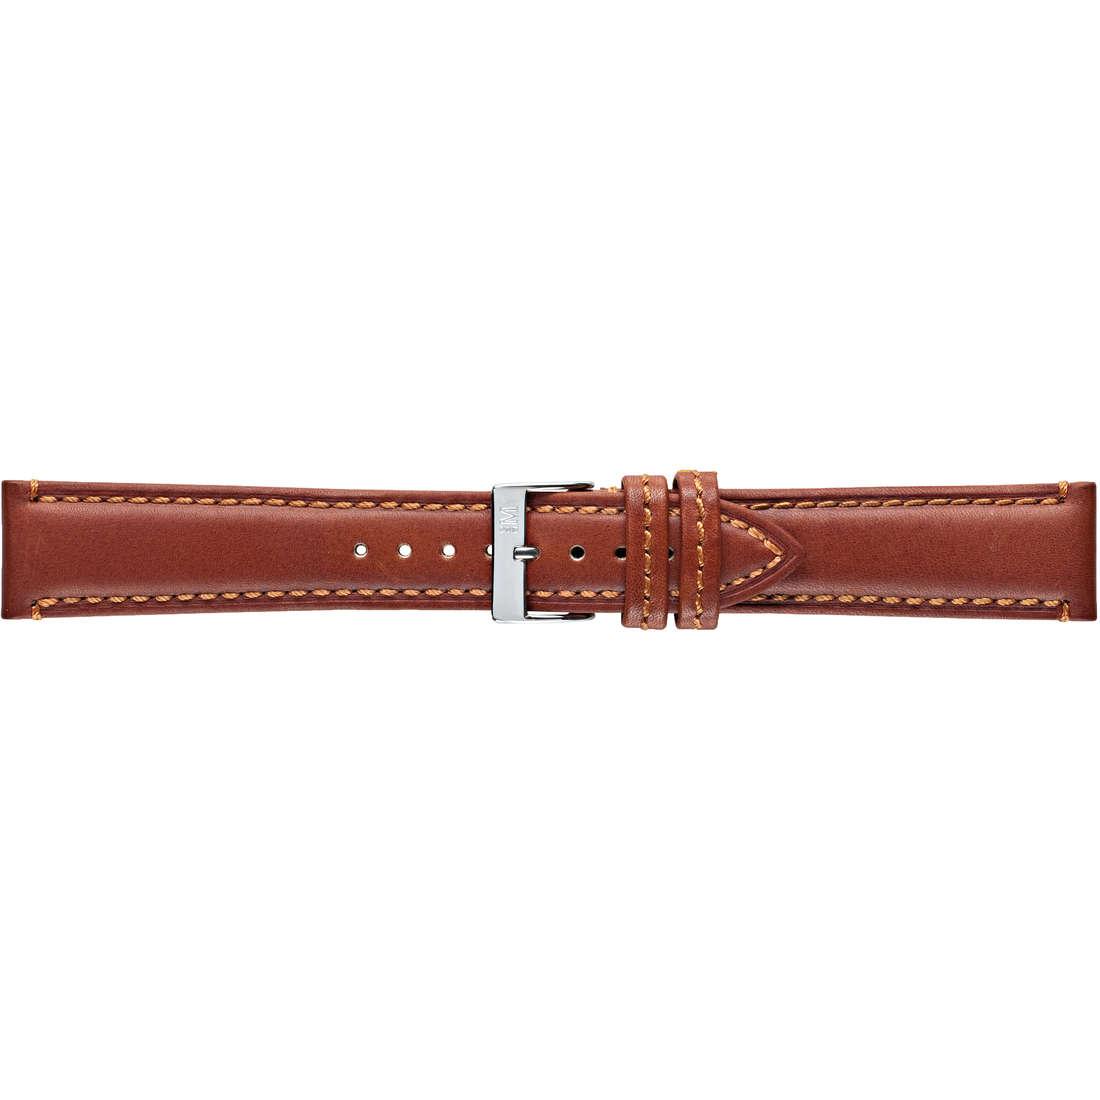 watch watch bands watch straps man Morellato Manufatti A01U3628A17041CR18